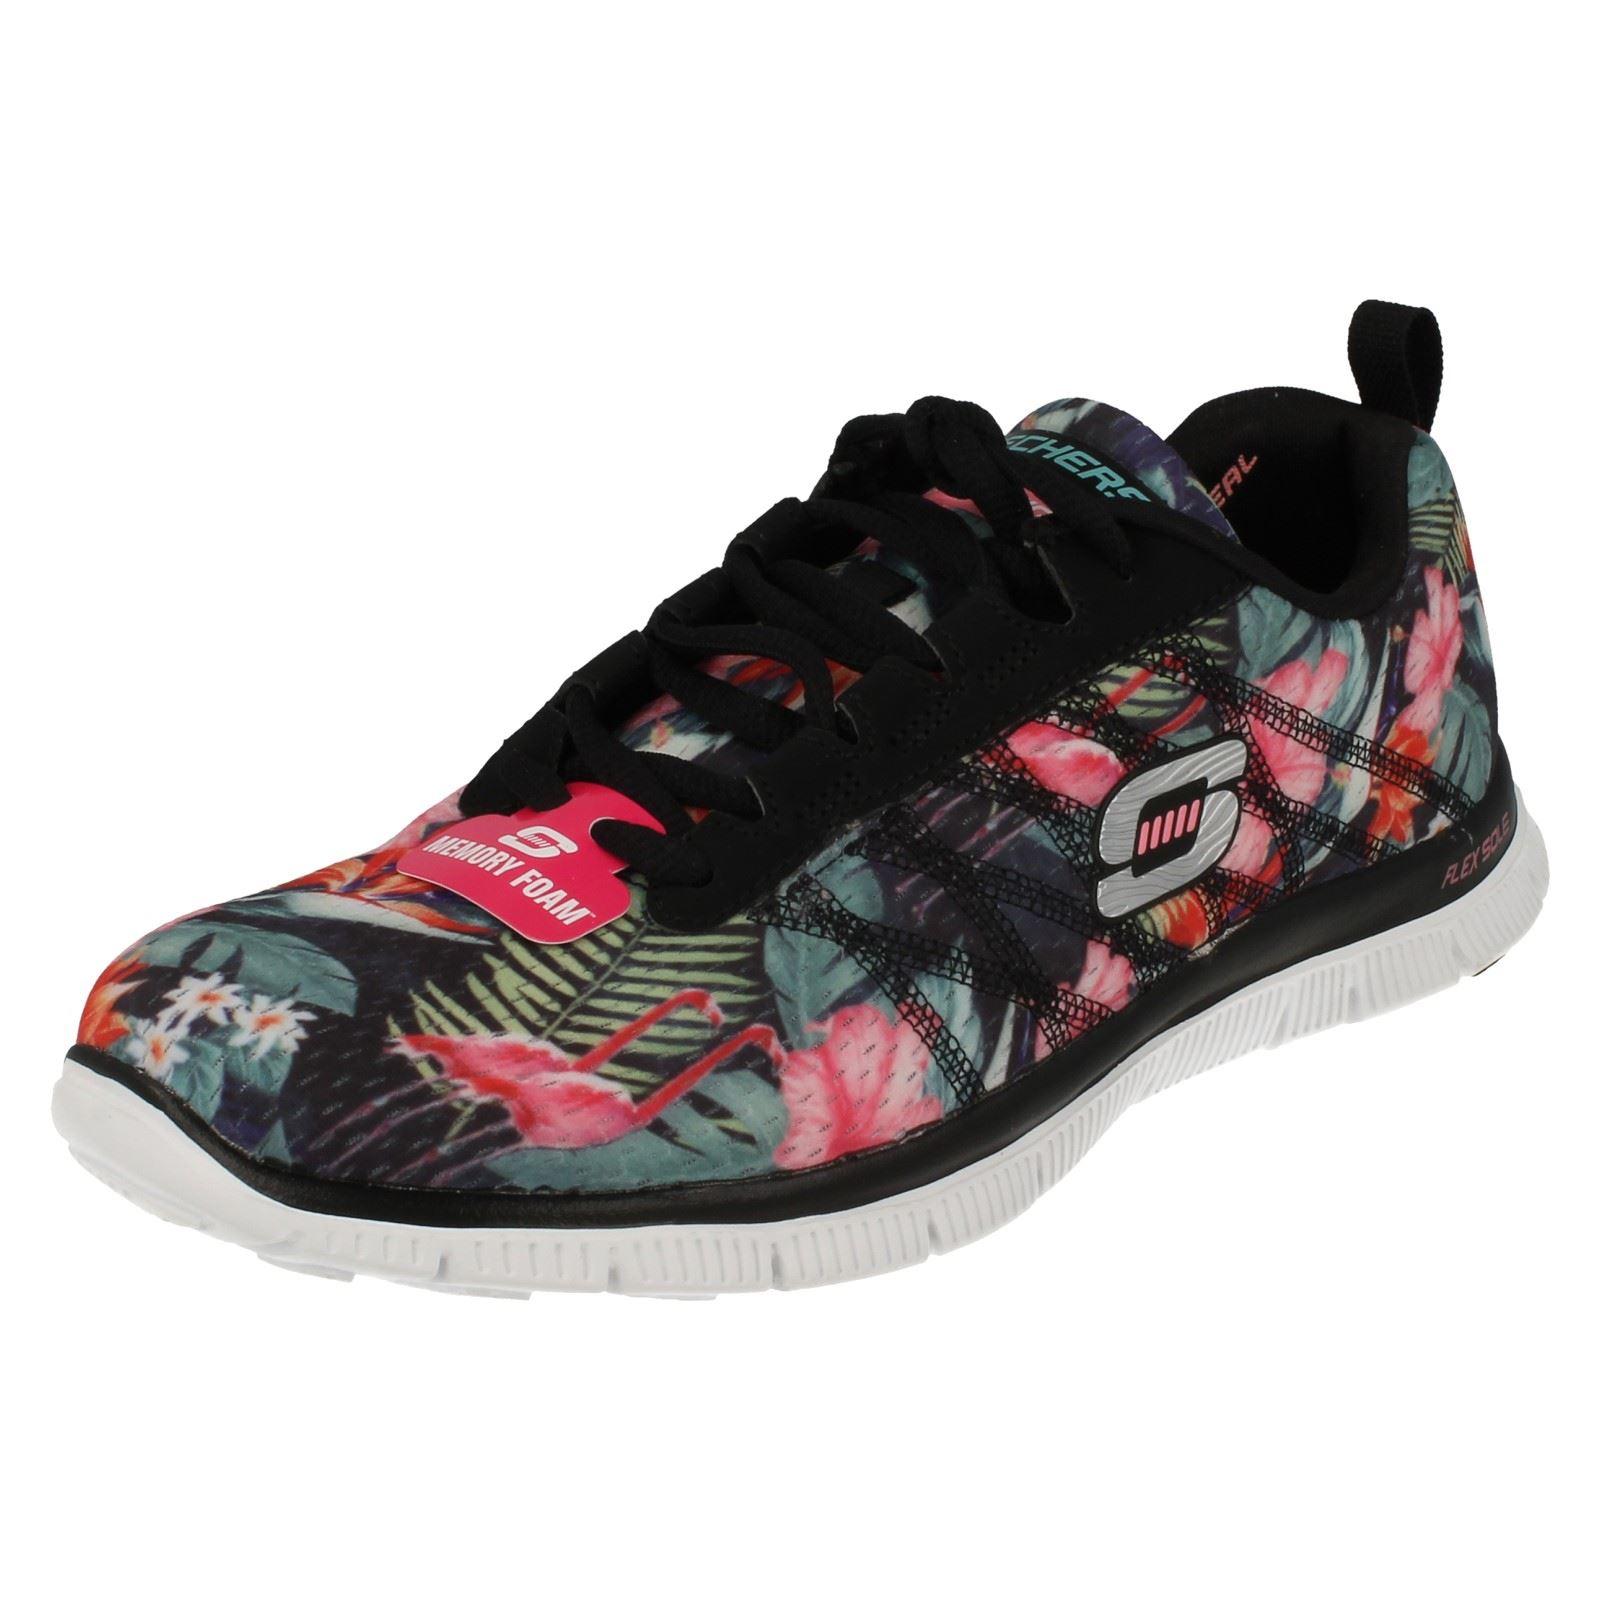 Flex Appeal Floral Bloom   Skechers, Shoes, Skechers mens